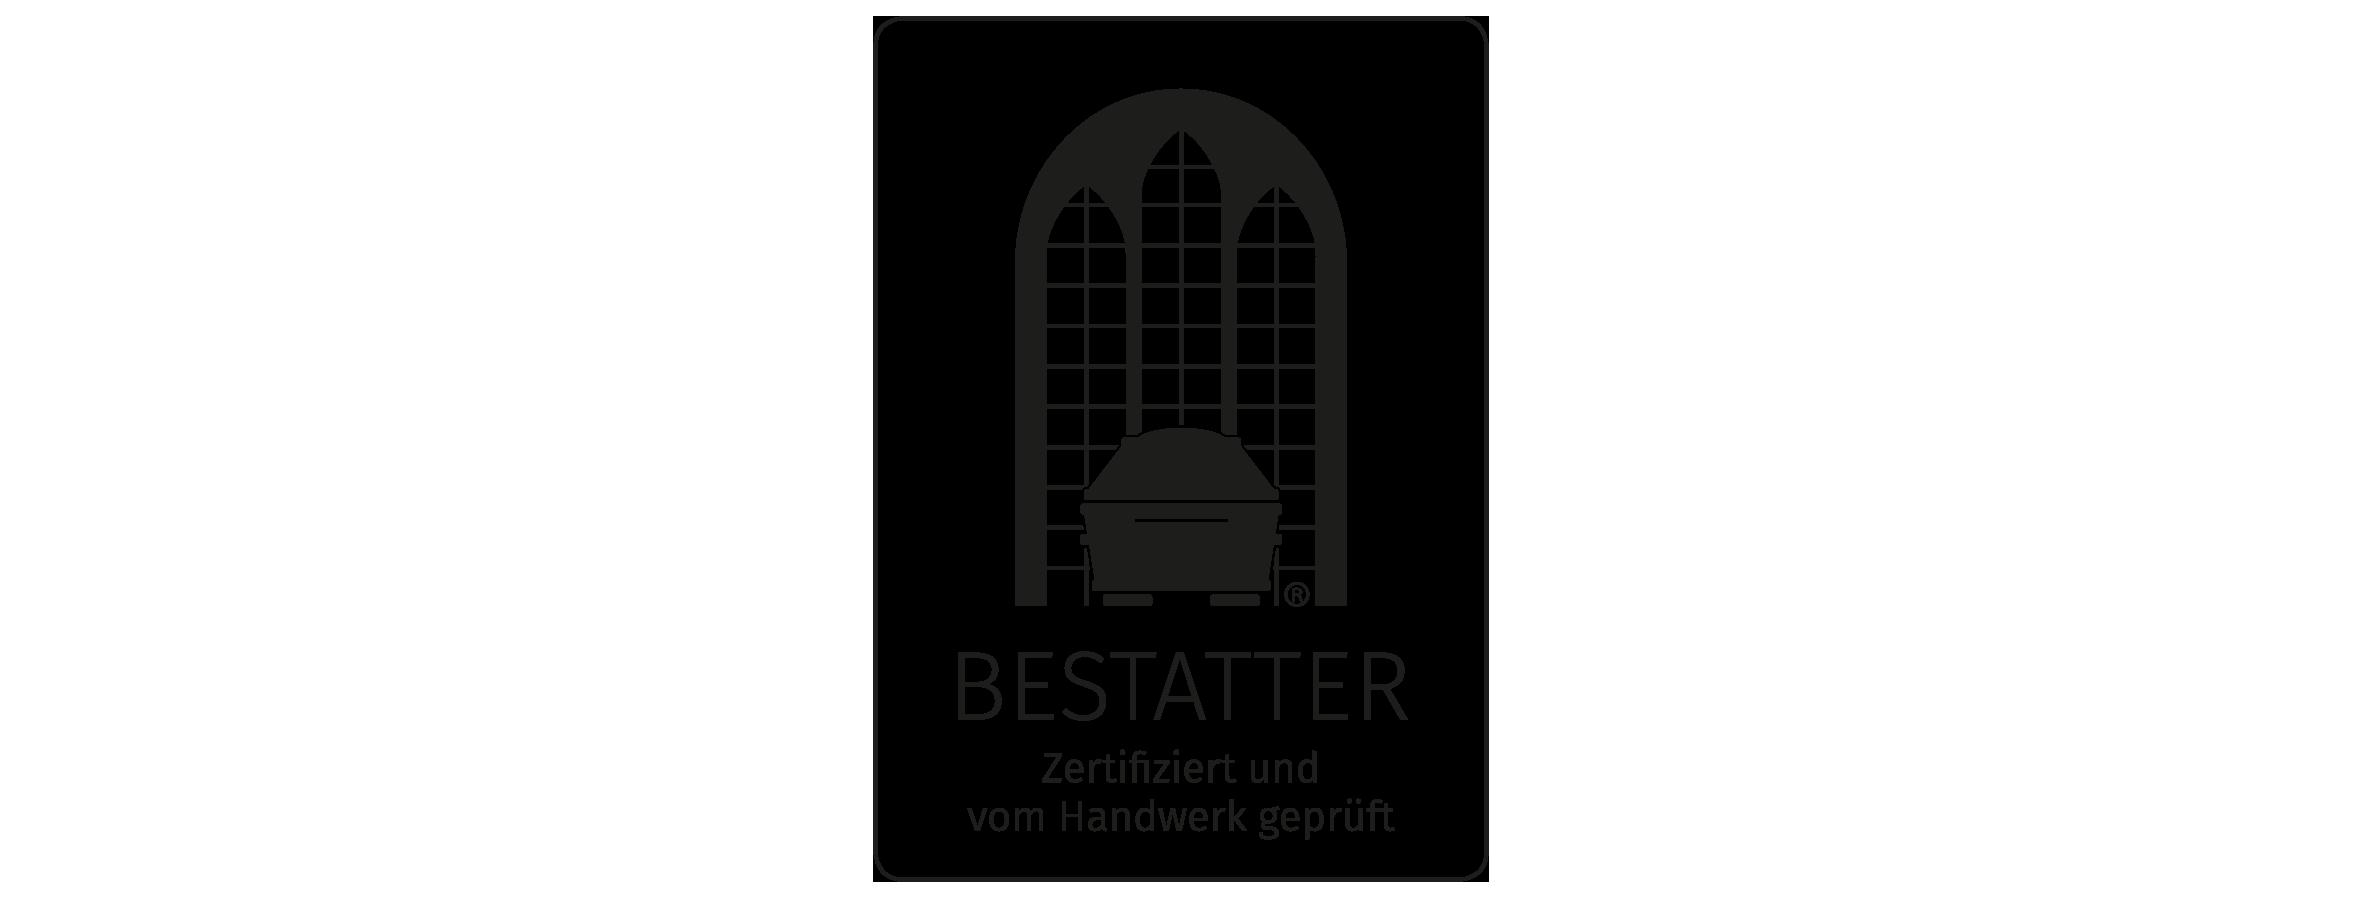 logo_bestatterverband_2